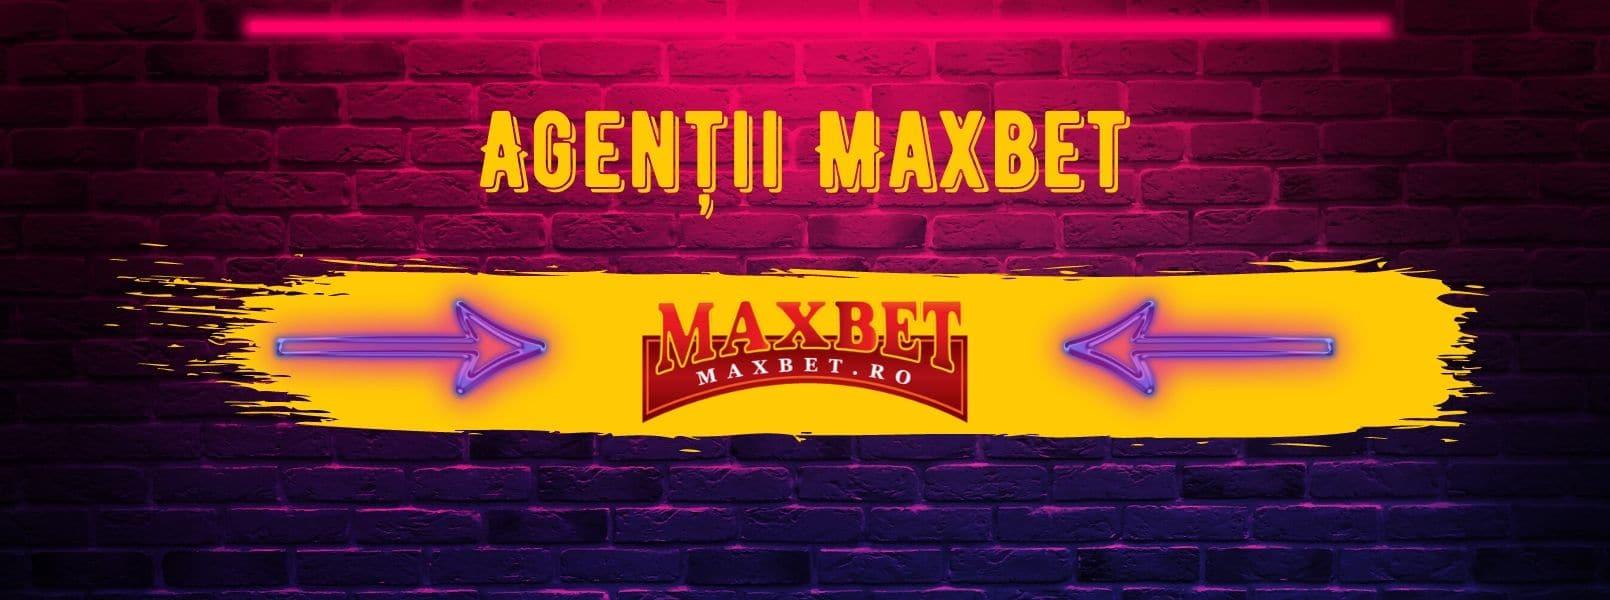 program agentii maxbet